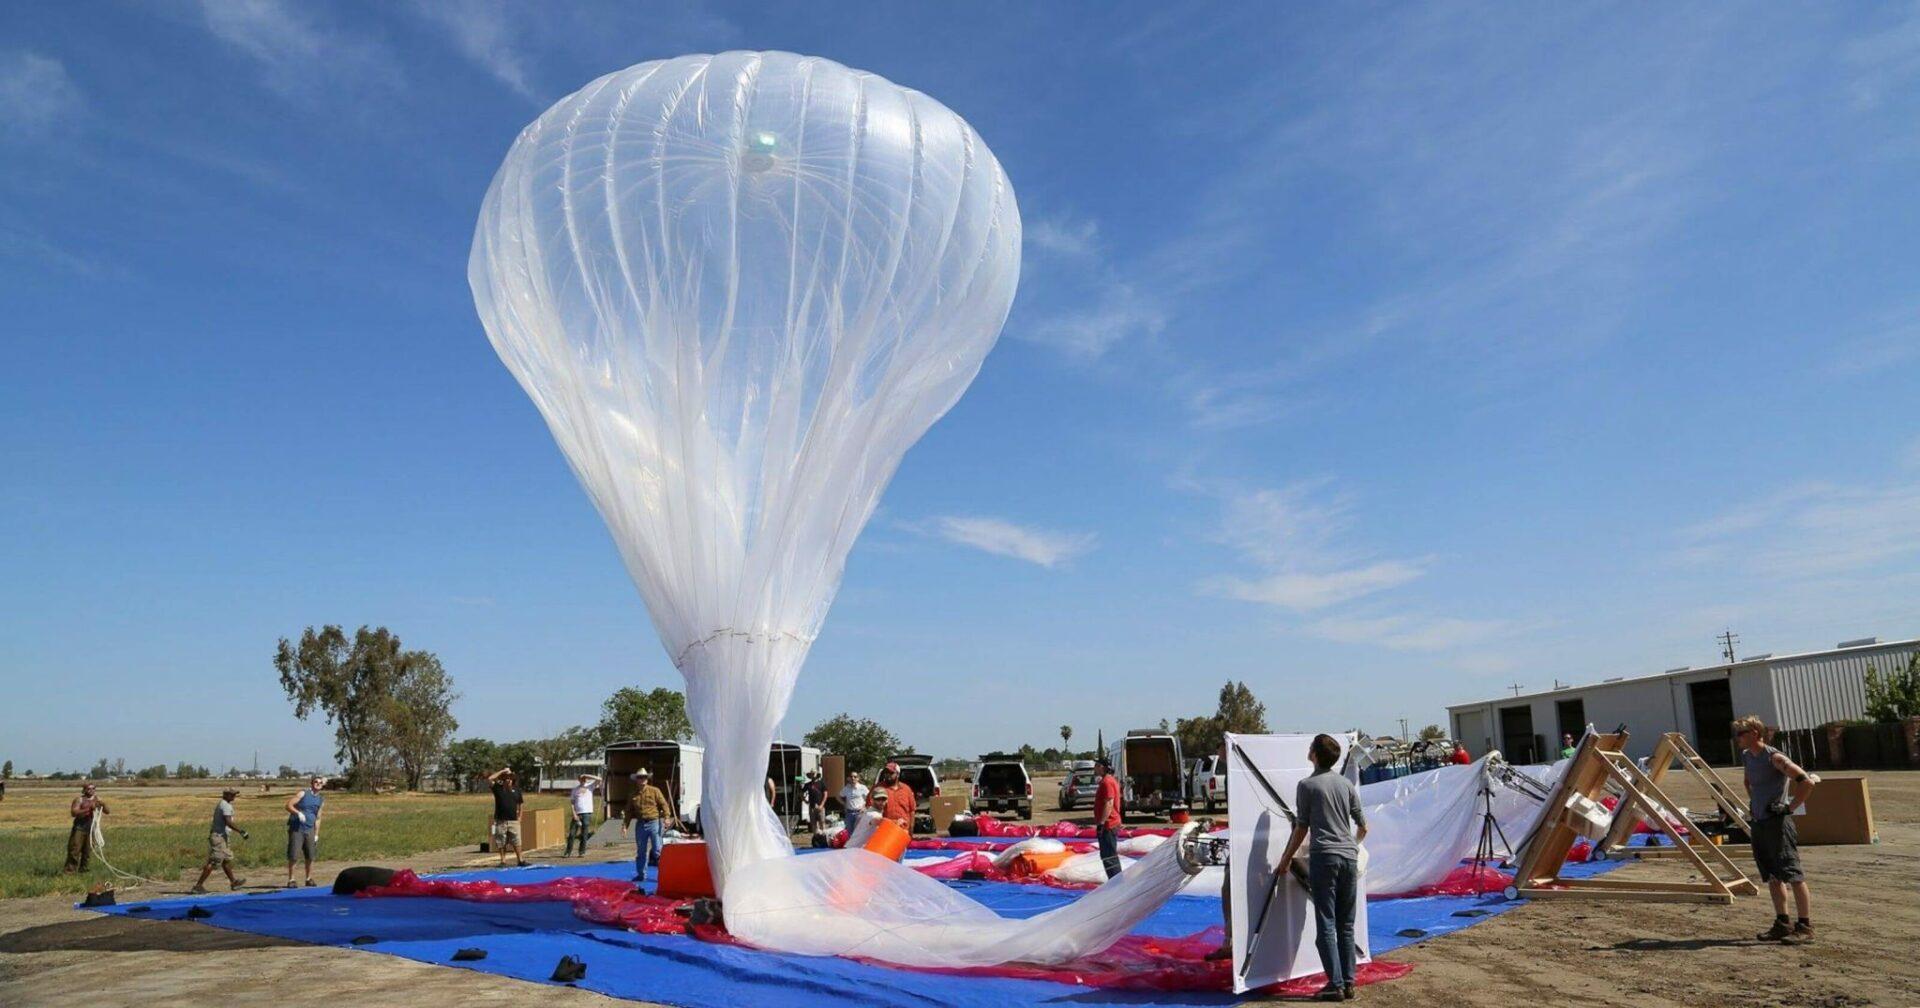 Google loon Balloons